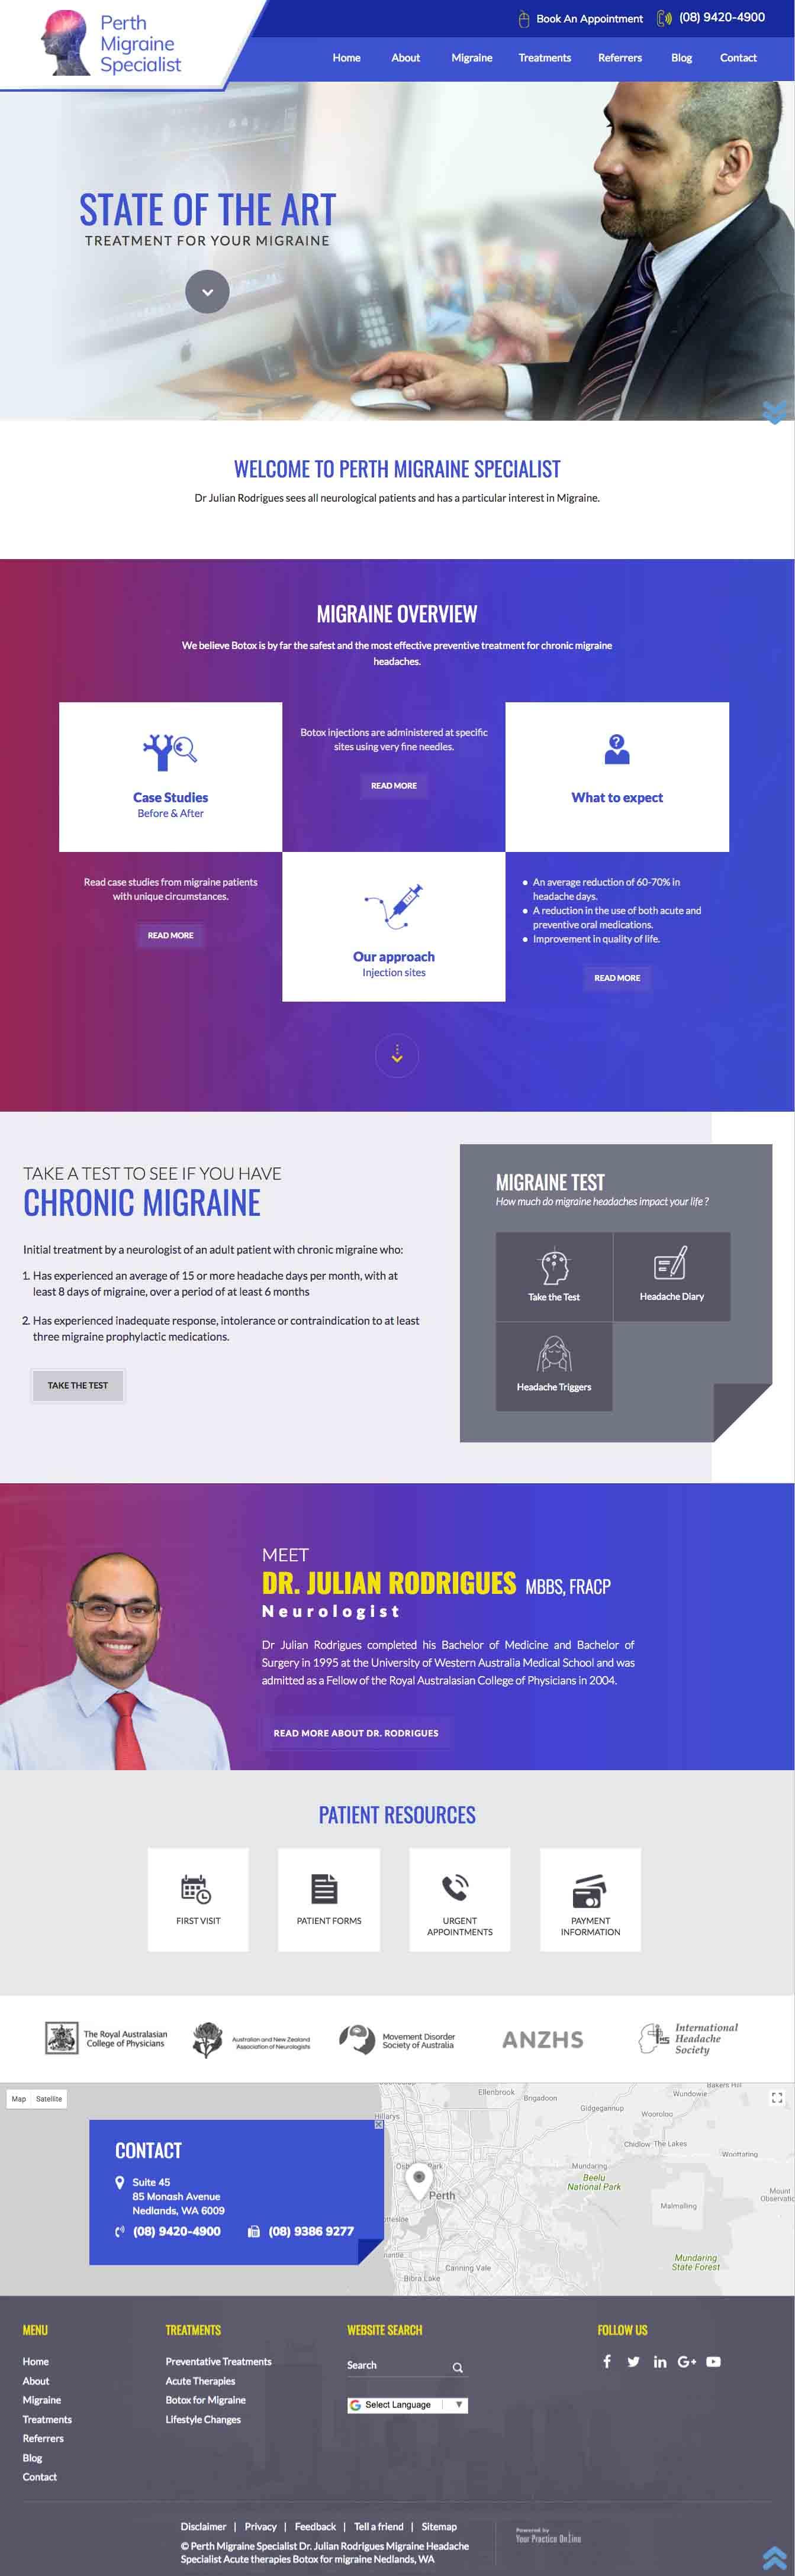 Perth Neurologist Migraine Specialist Website